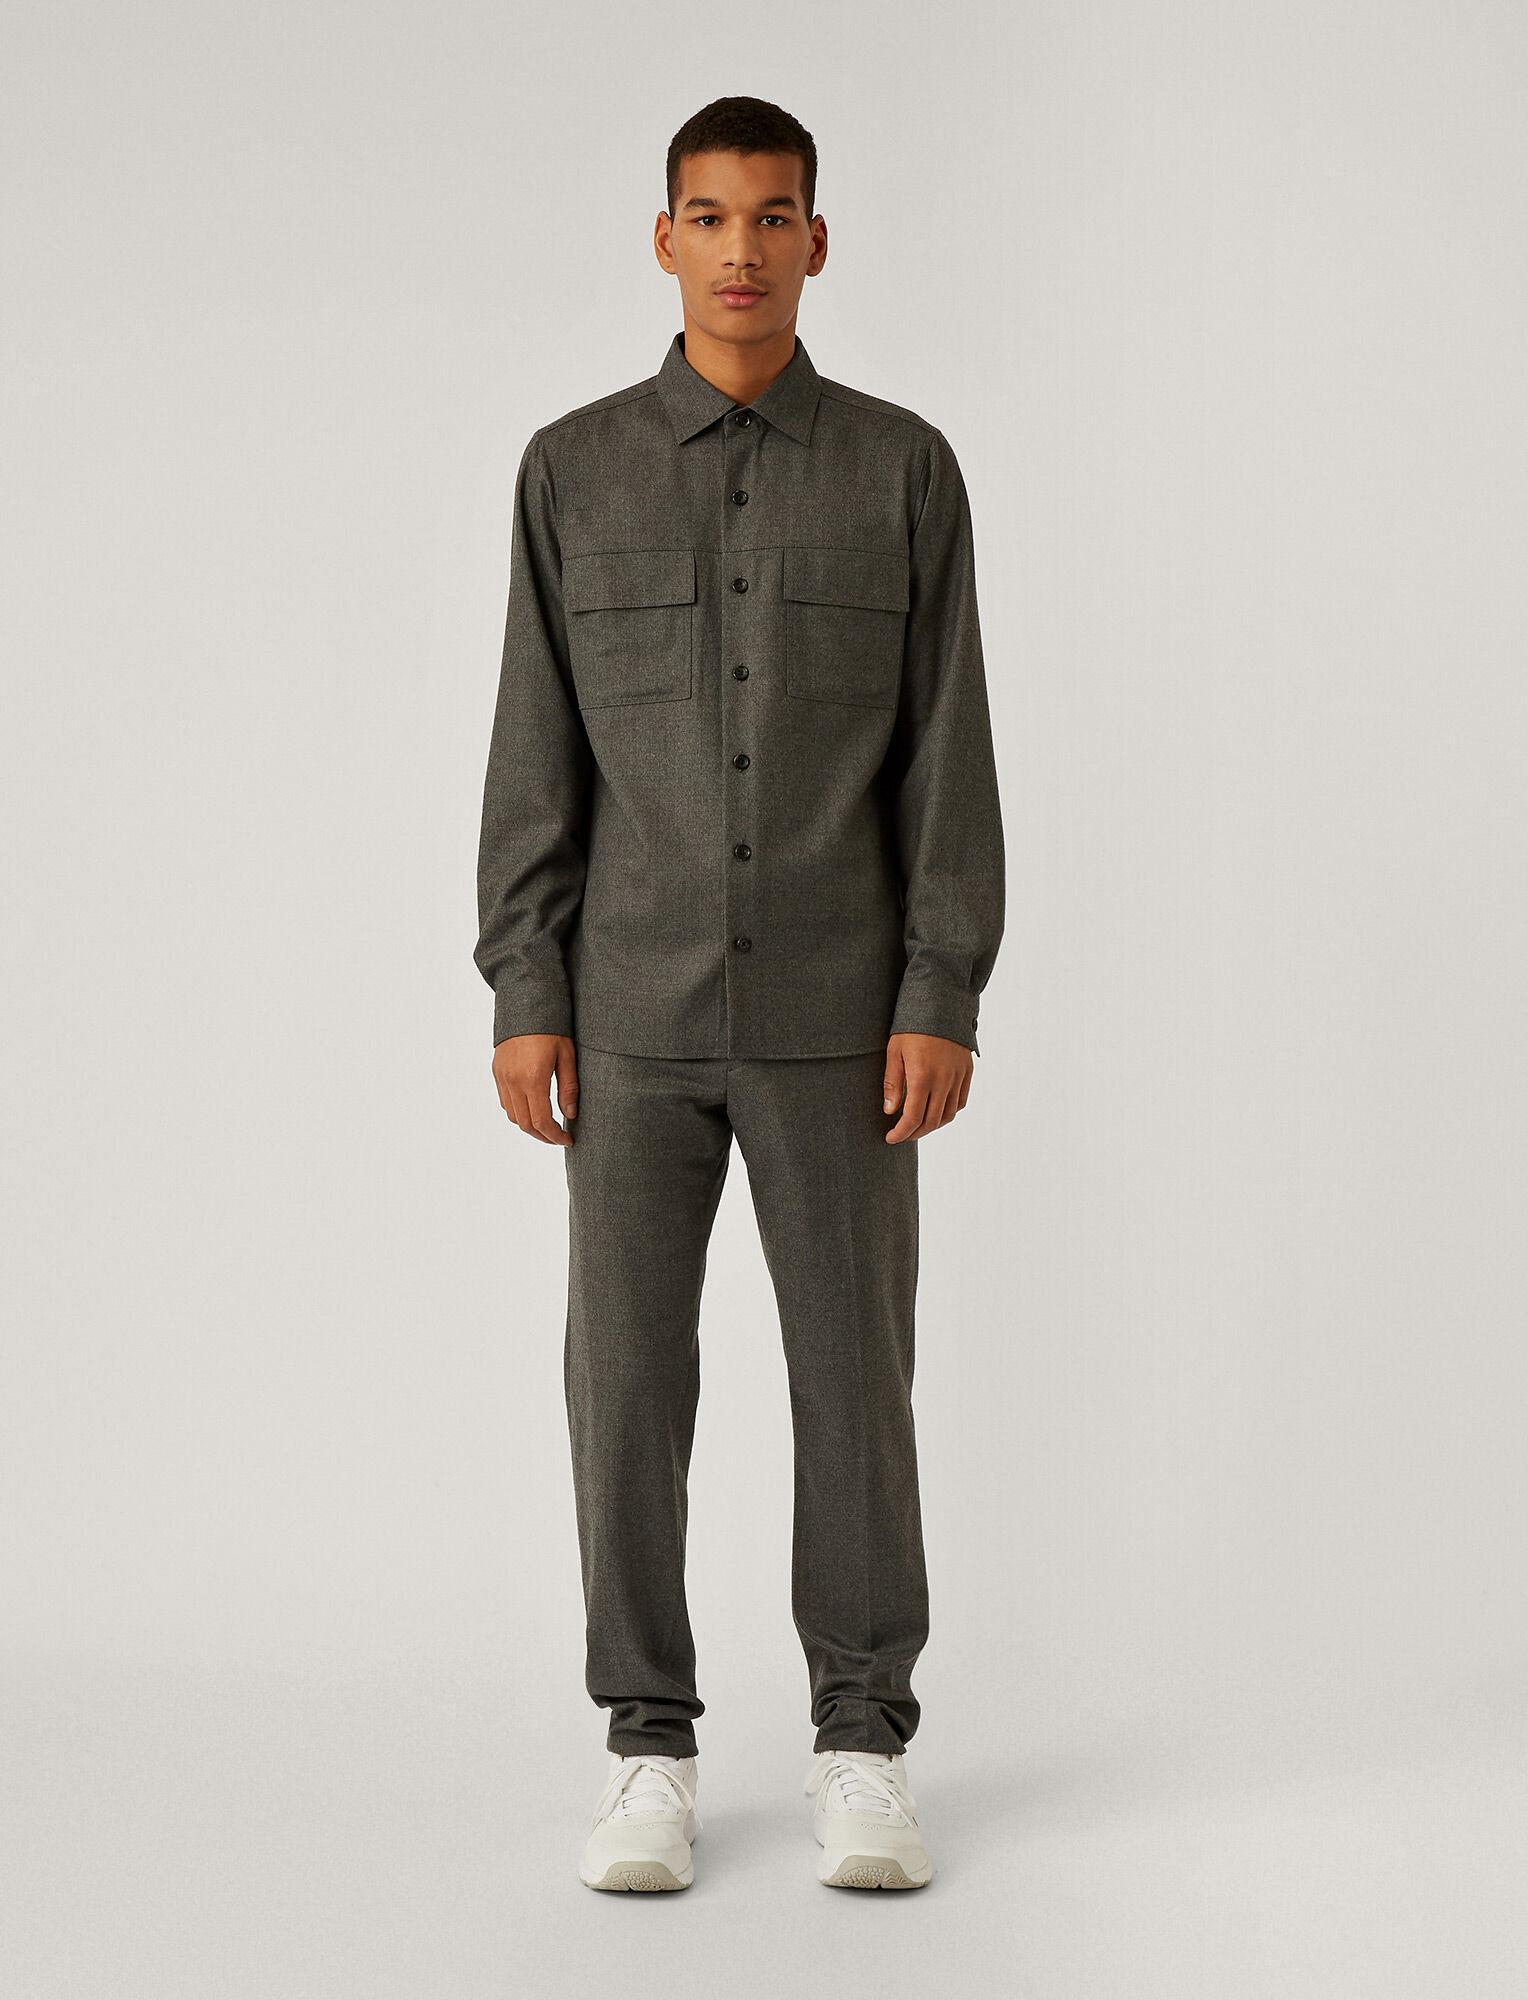 Joseph, Flannel Stretch Shirt, in LIGHT GREY